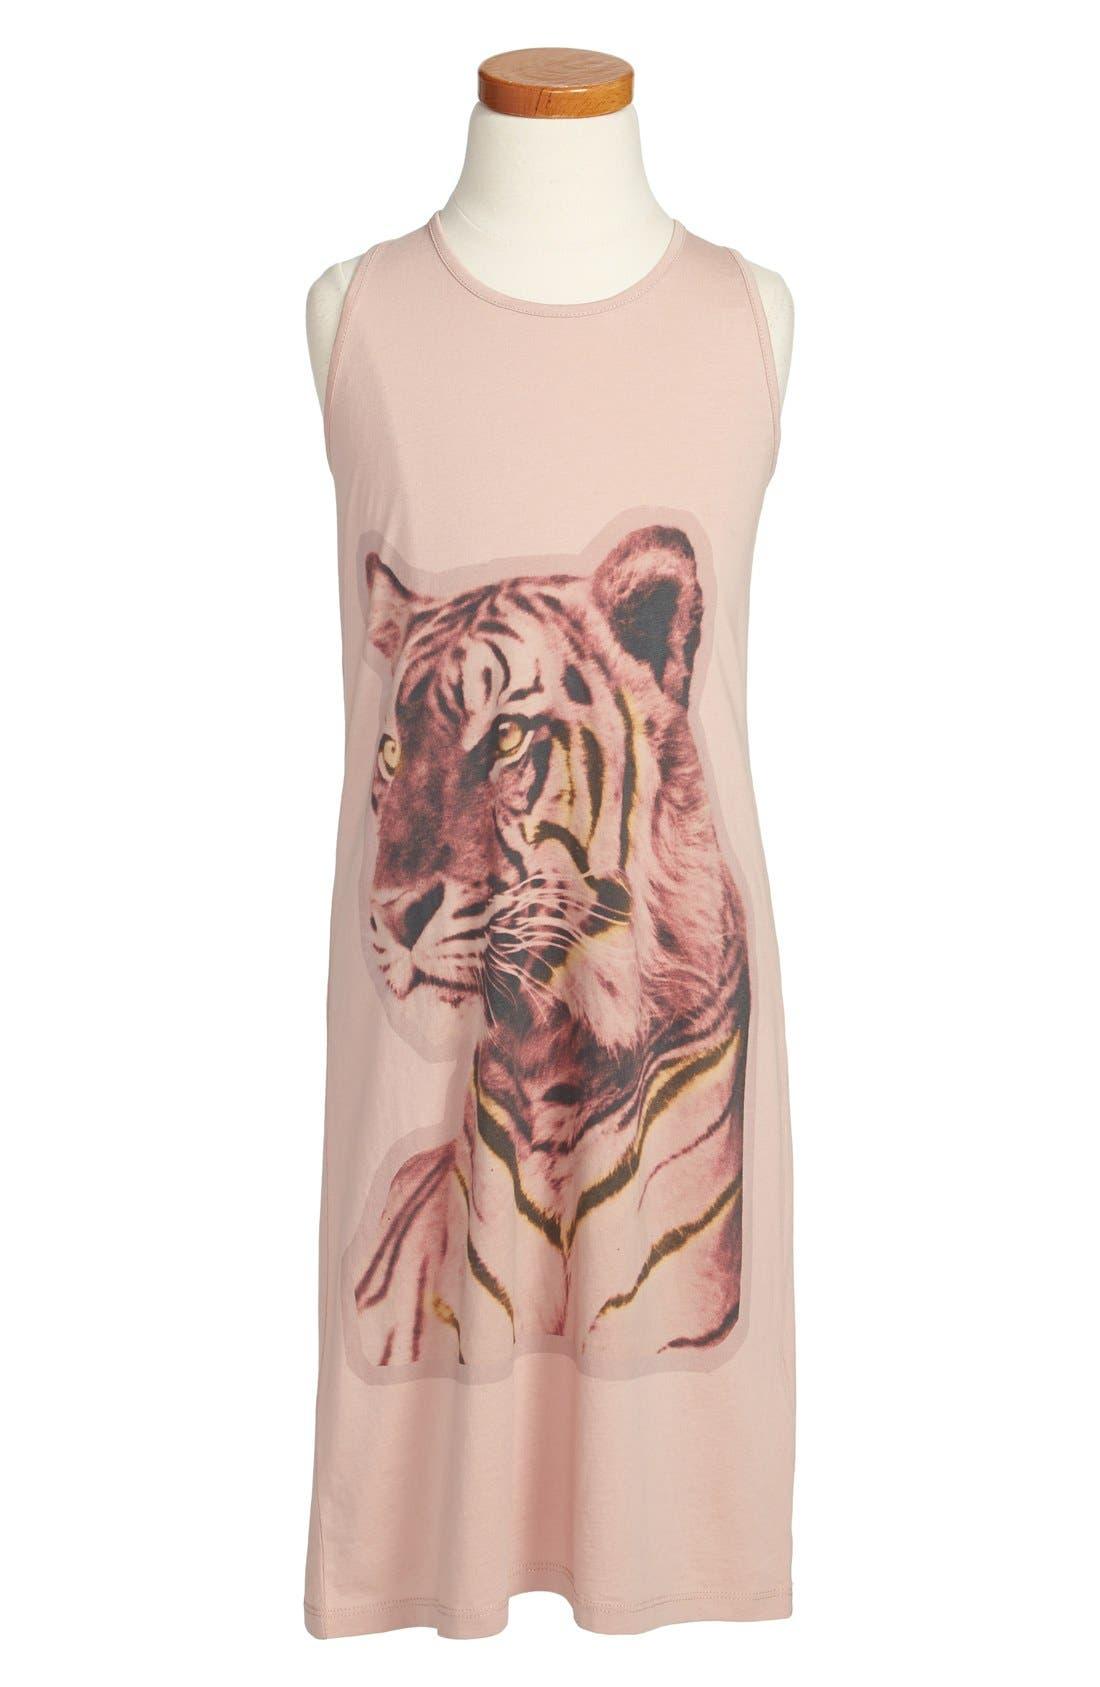 Alternate Image 1 Selected - Stella McCartney 'Mia' Tiger Screenprint Tank Dress (Toddler Girls, Little Girls & Big Girls)